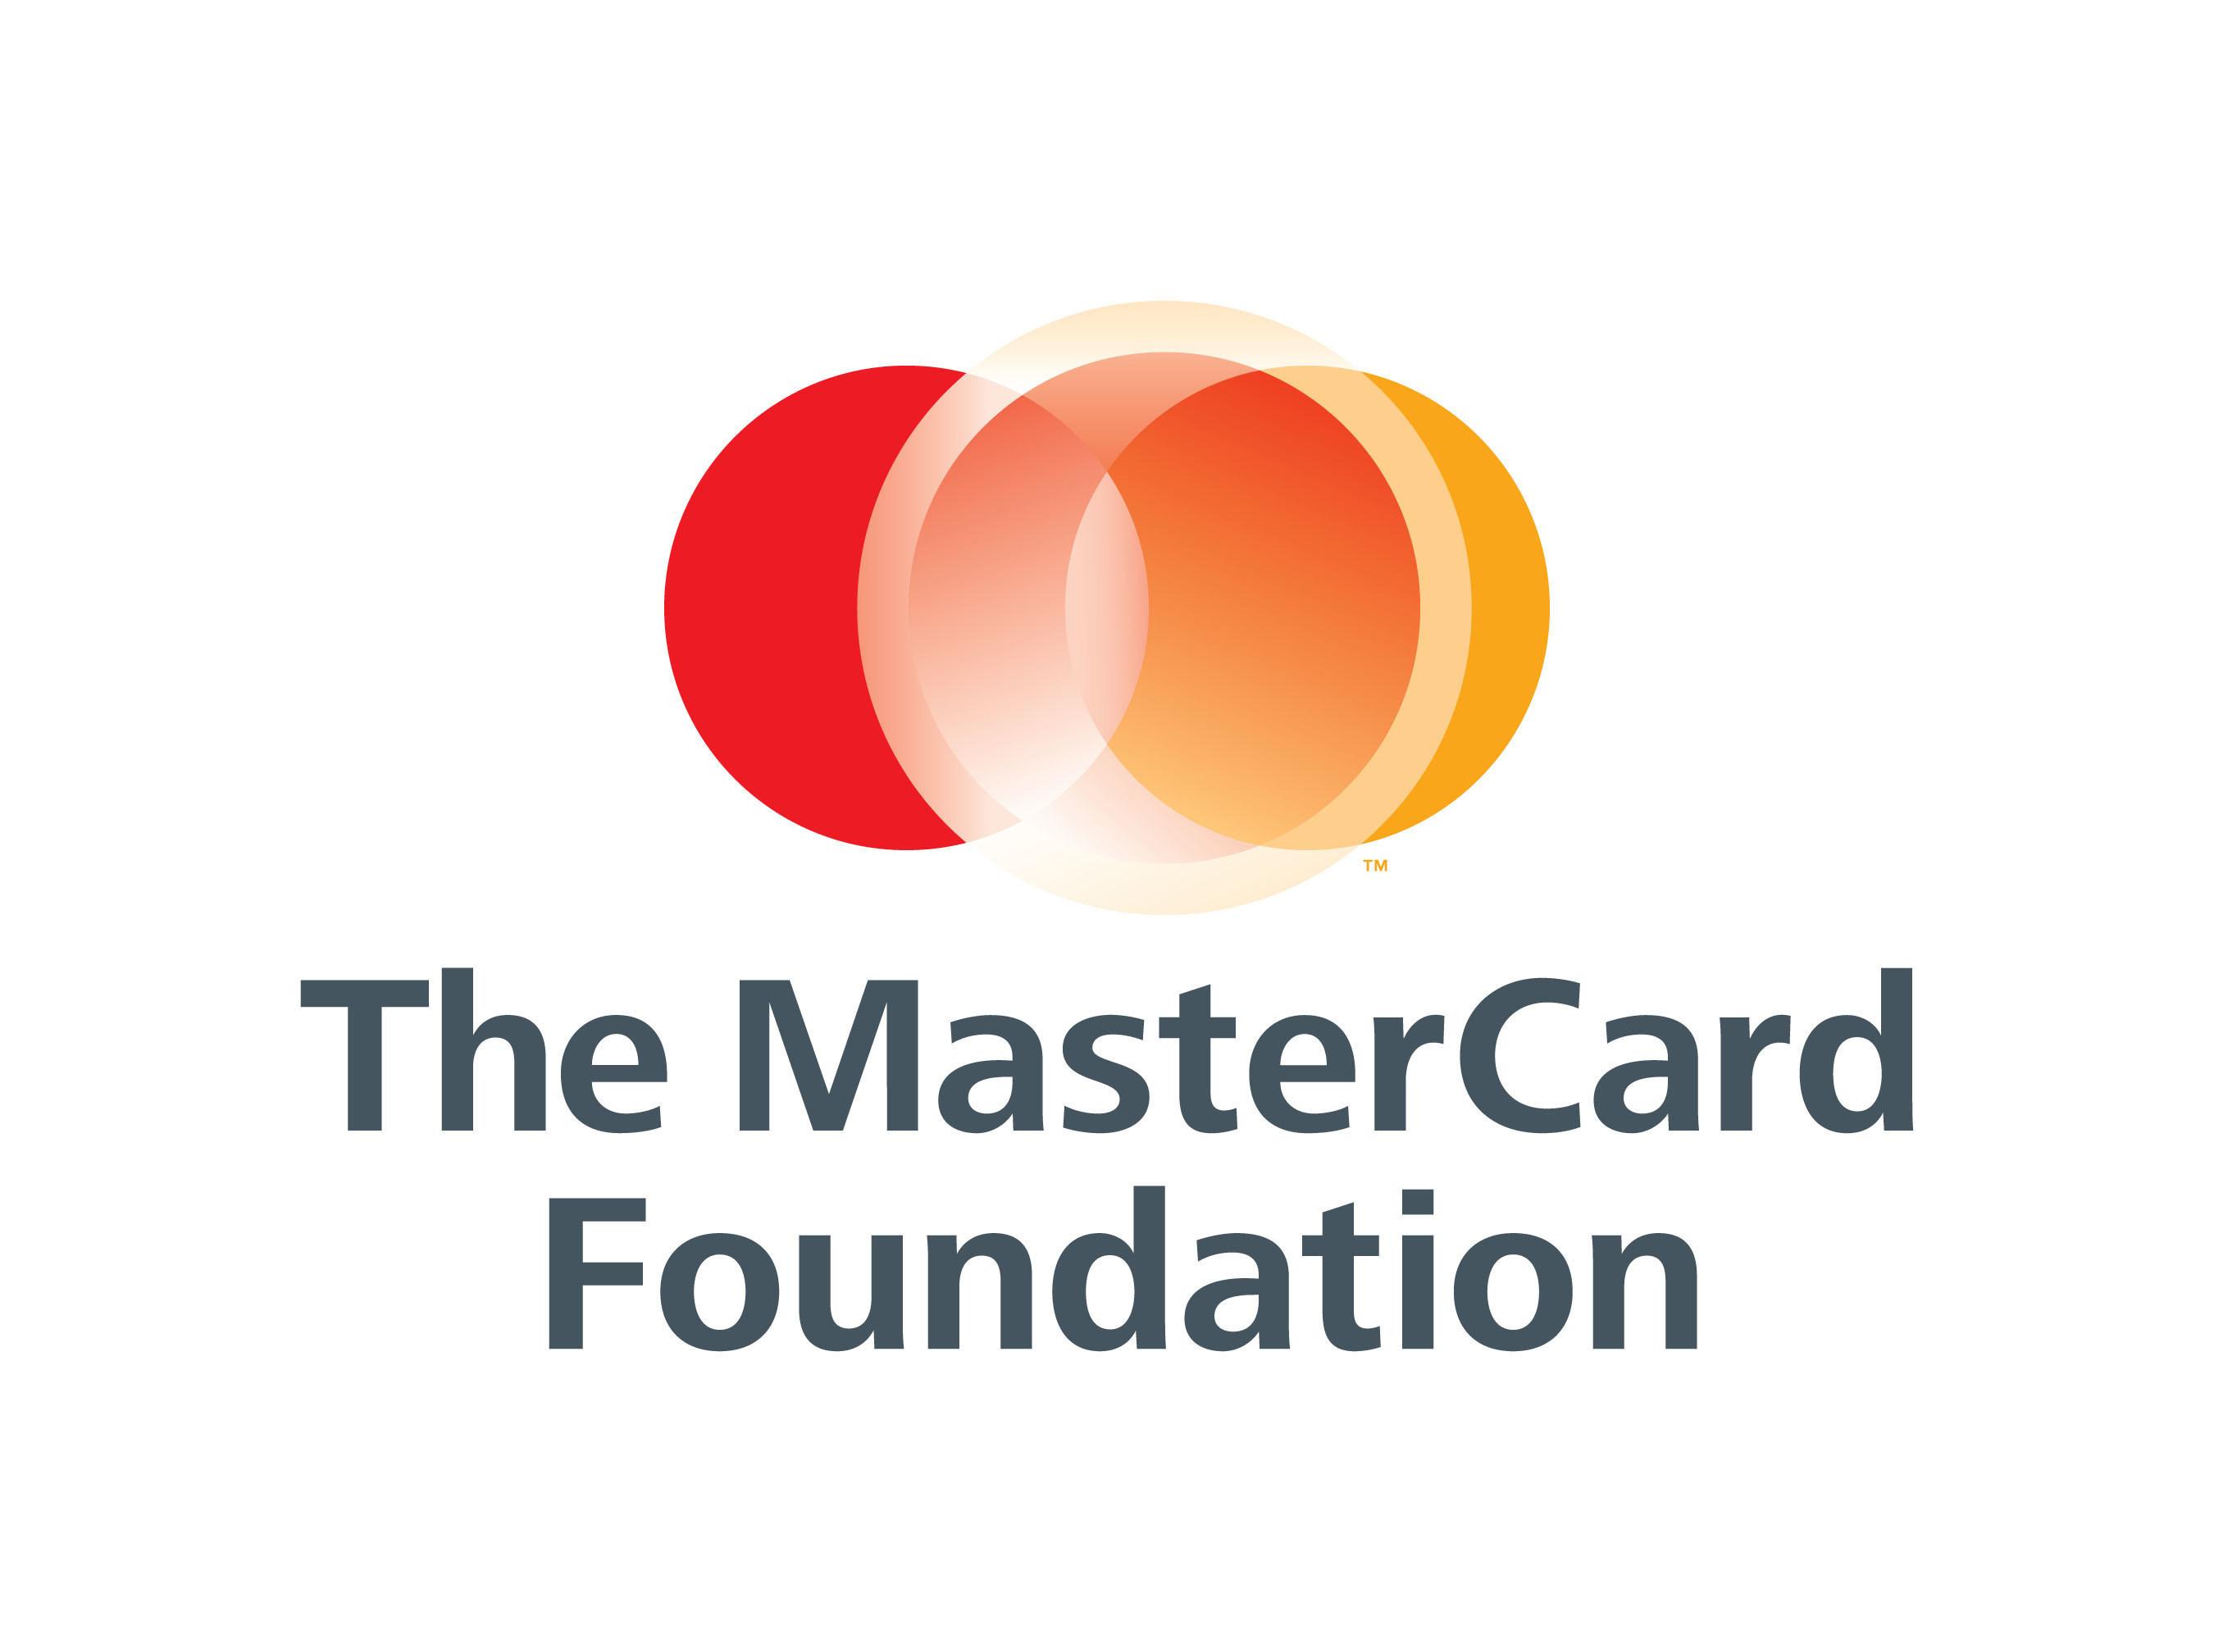 Le Center for Financial Inclusion at Accion et The MasterCard Foundation s'associent pour renforcer